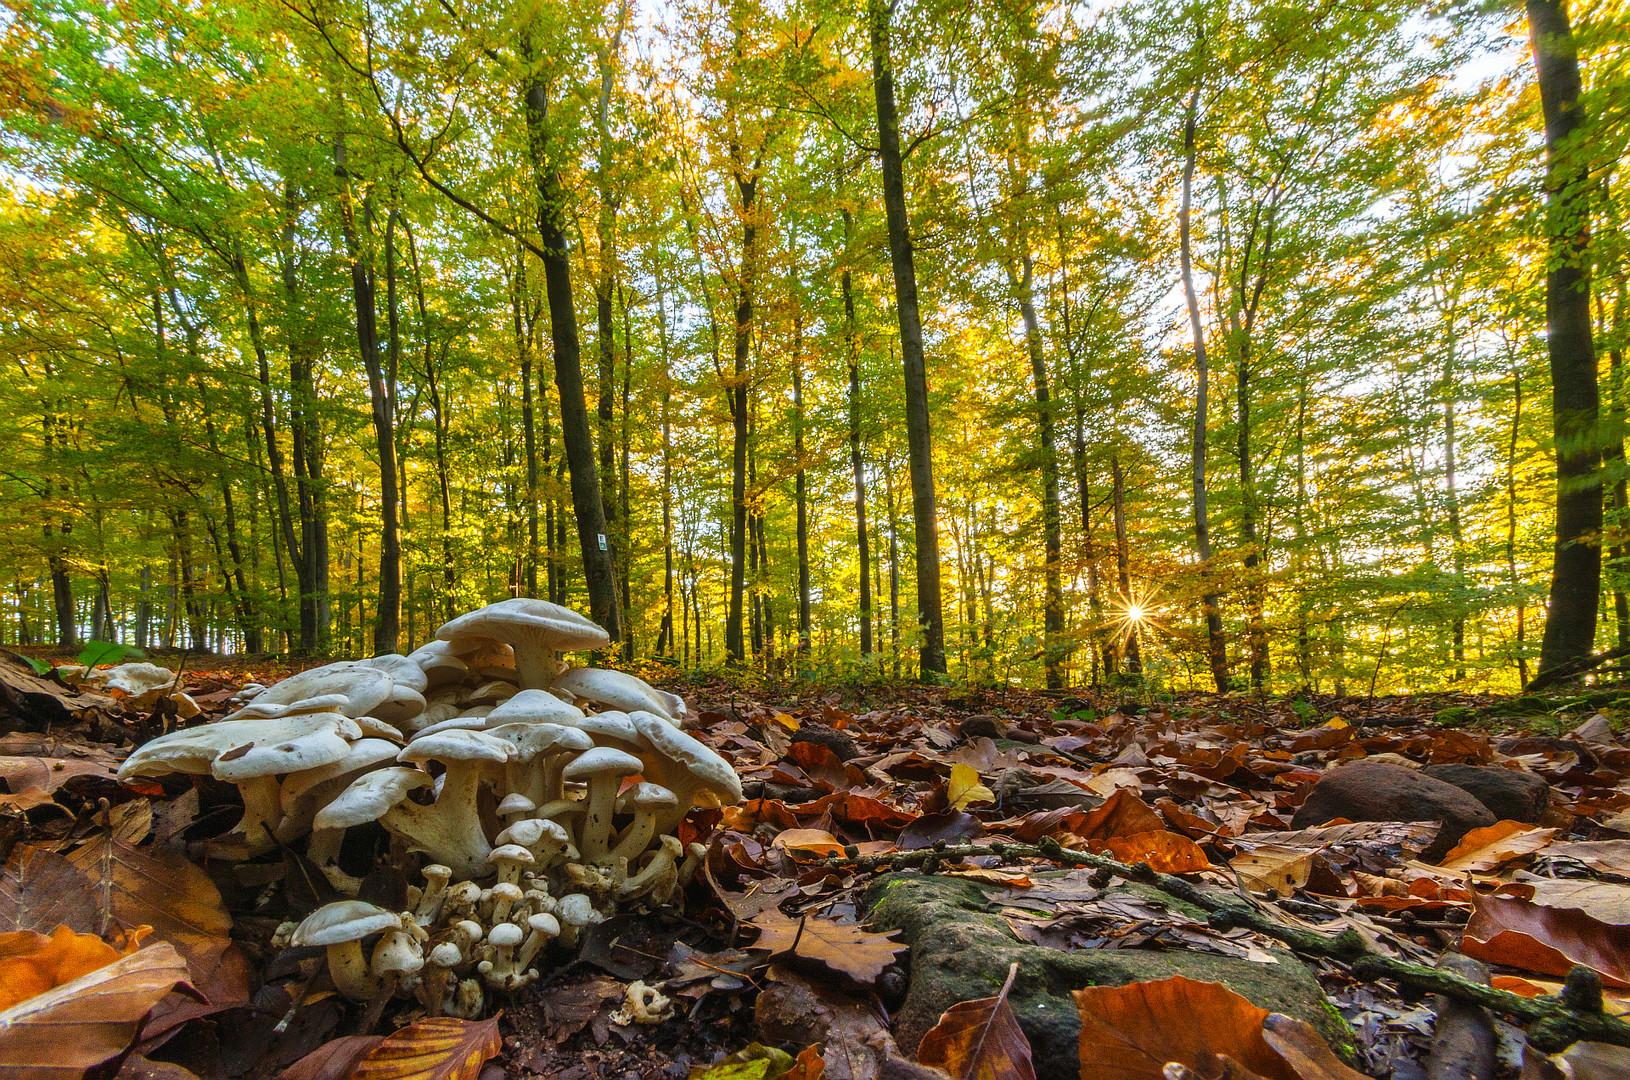 Herbstwald 2013 IV